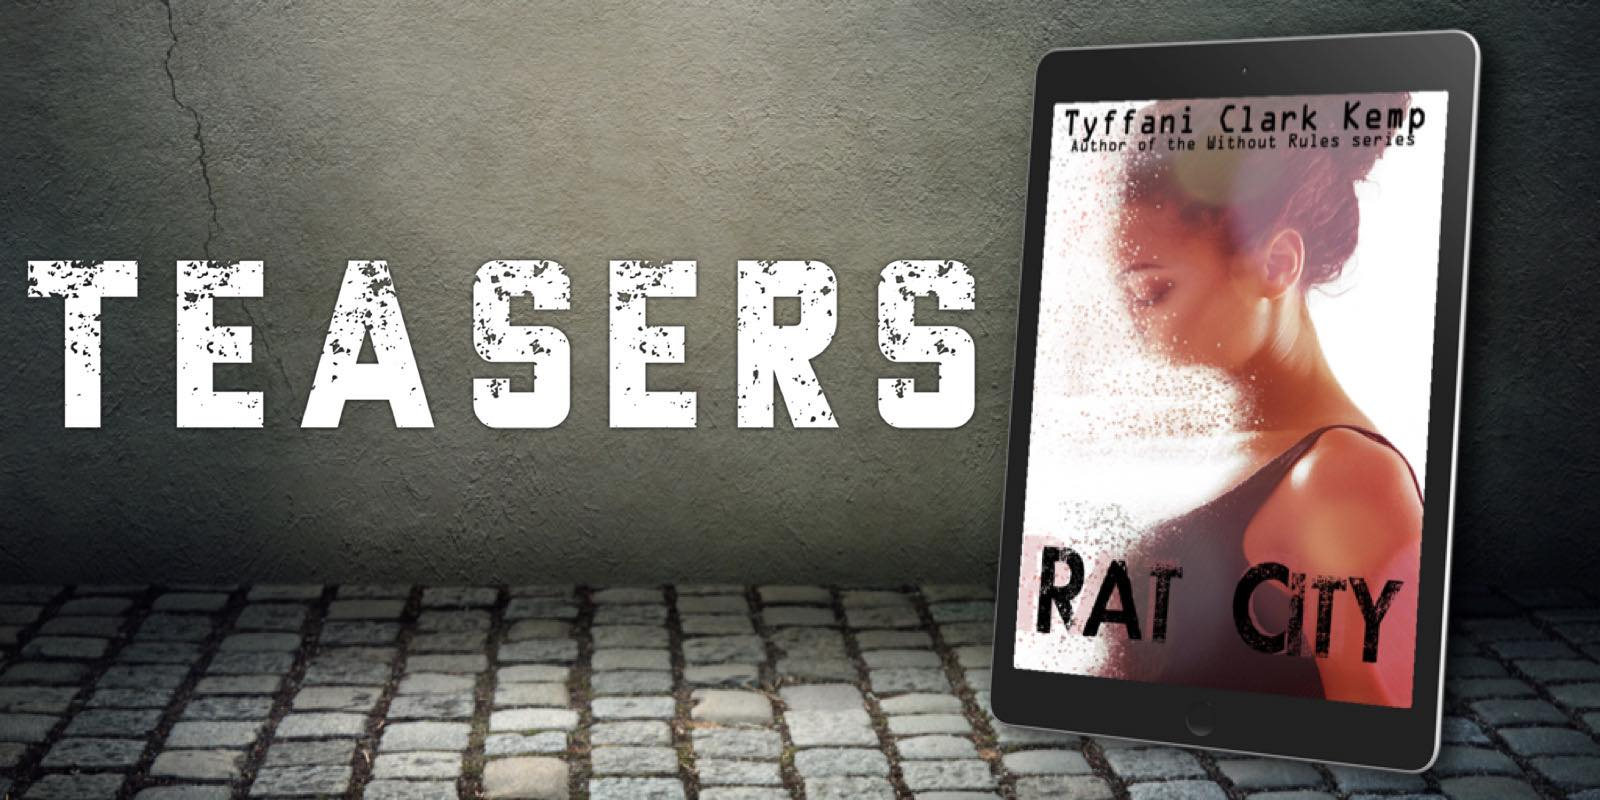 rat city teaser